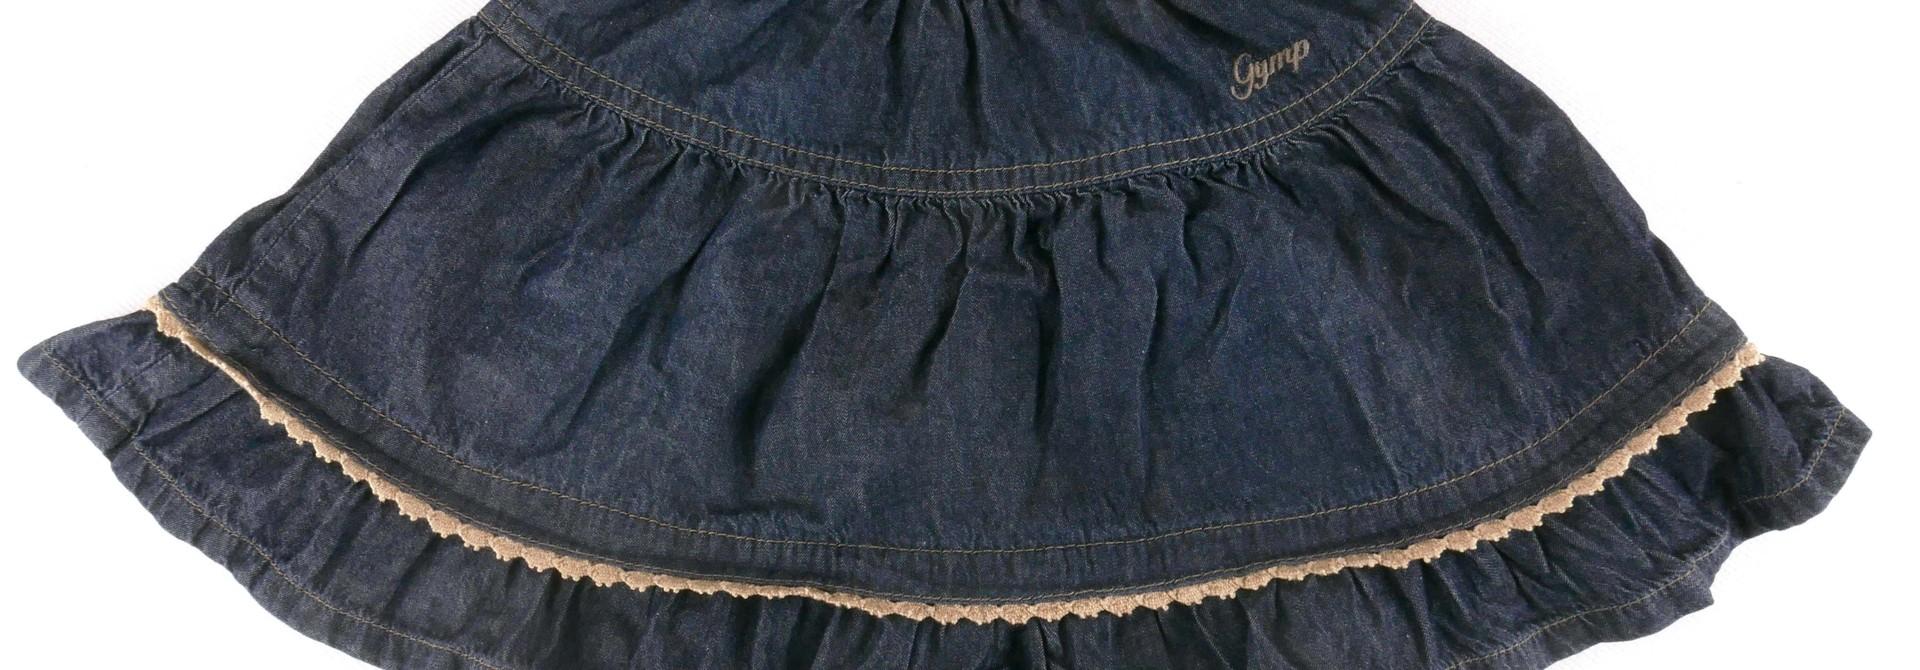 Jeans rok GYMP